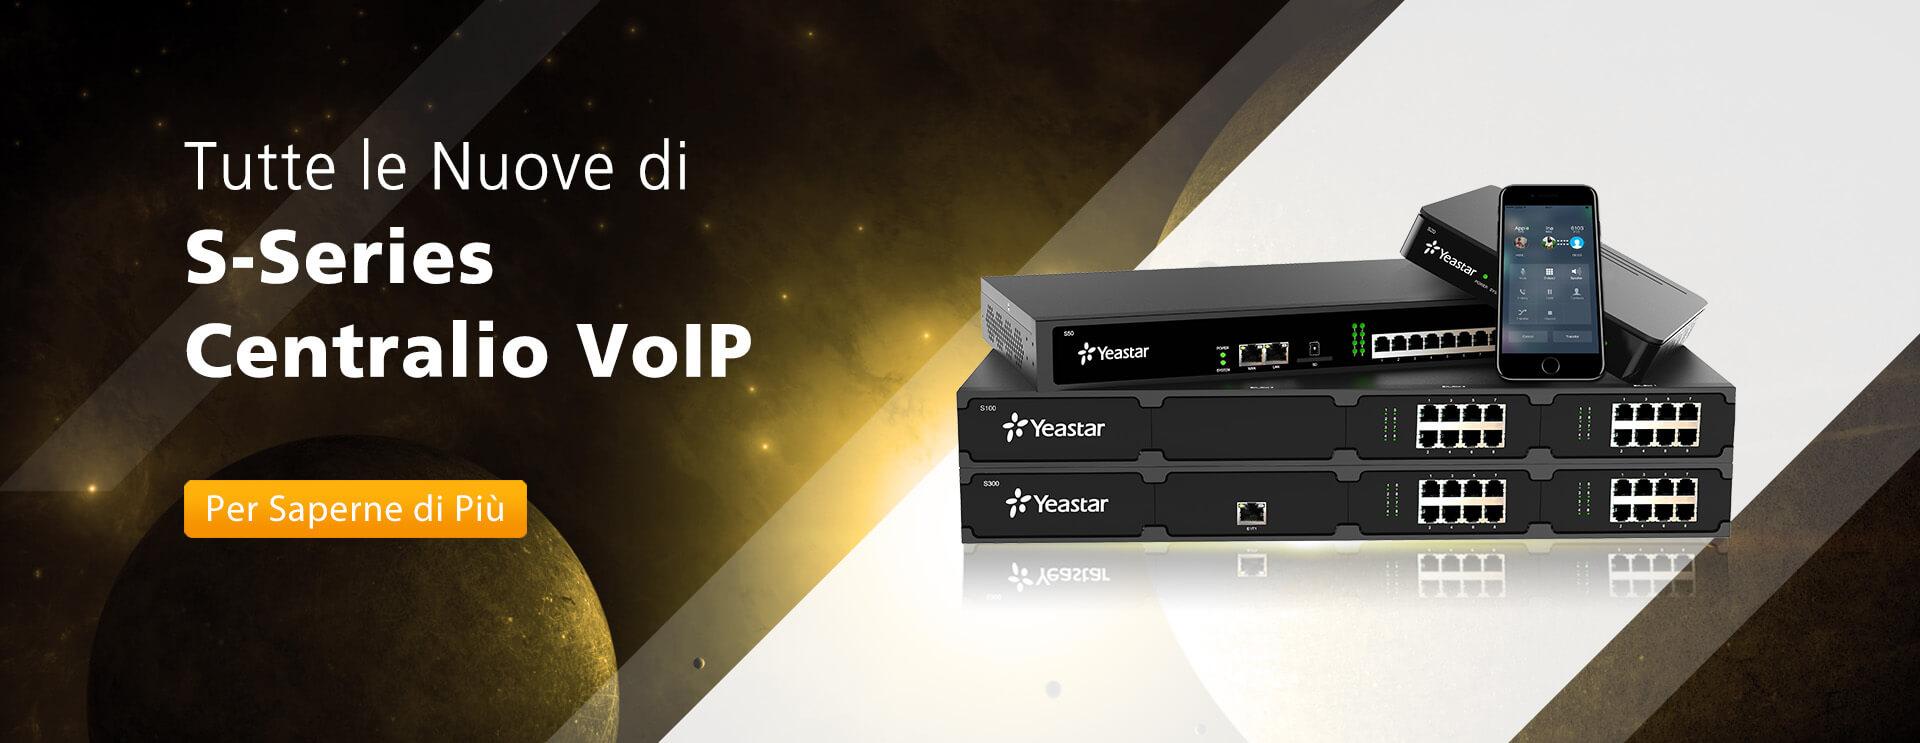 S-Series Centralio VoIP